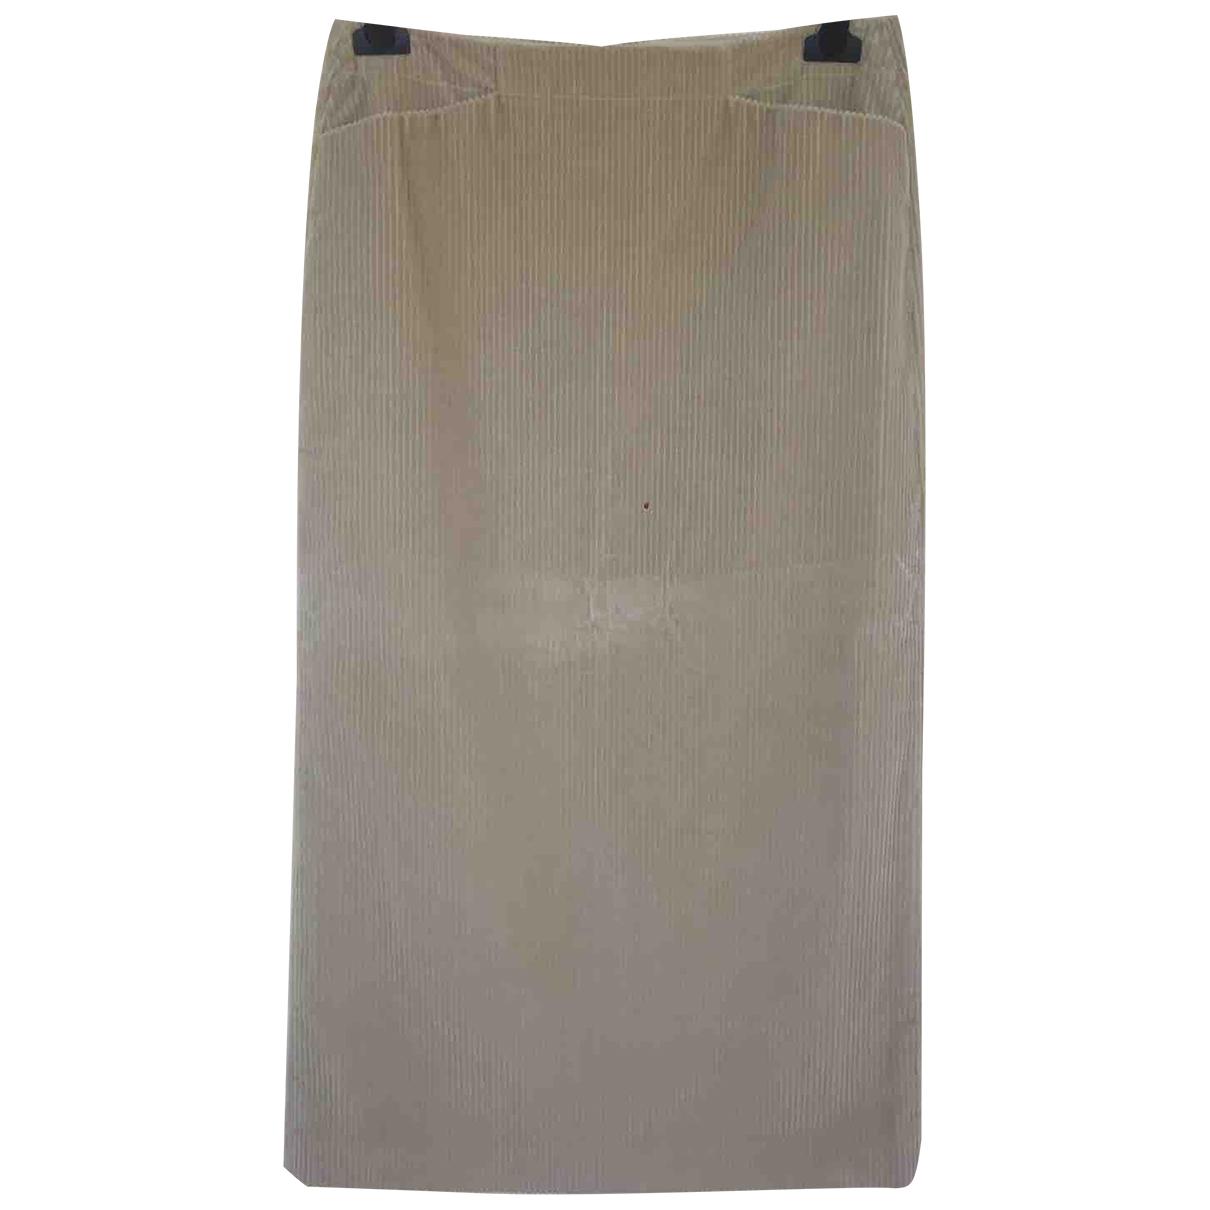 Max Mara 's \N Beige Cotton skirt for Women 42 IT